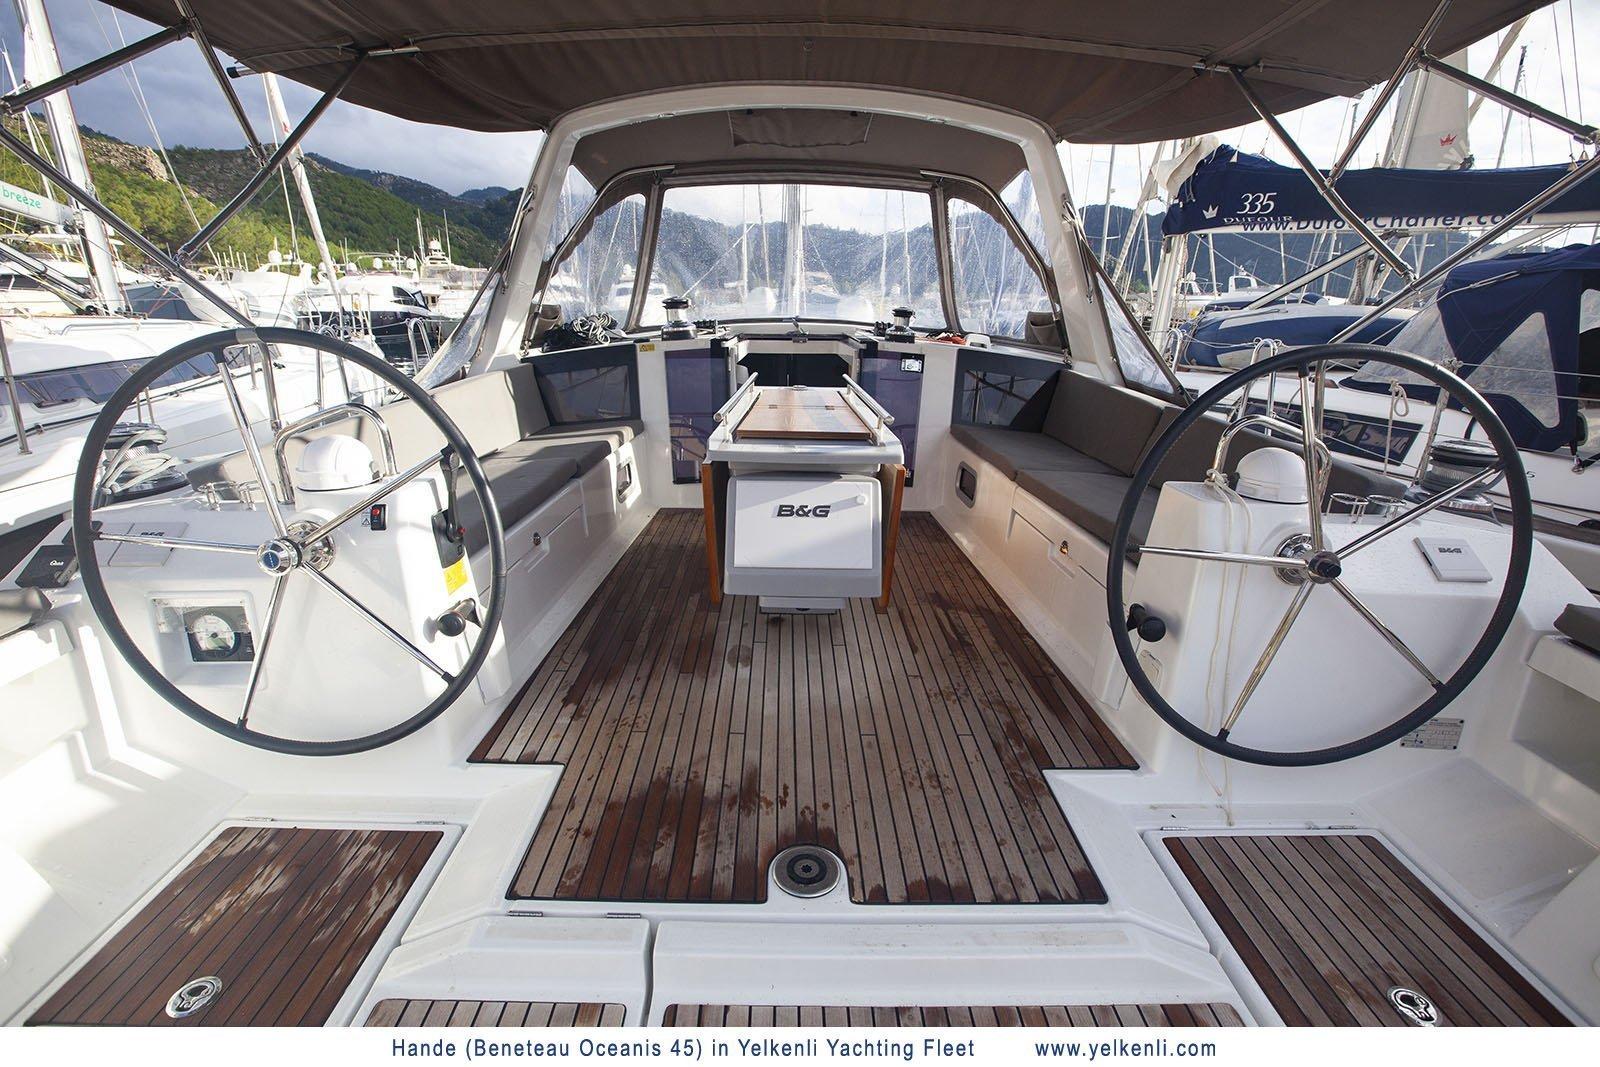 Oceanis 45 (2018) (Hande) Cockpit - 40